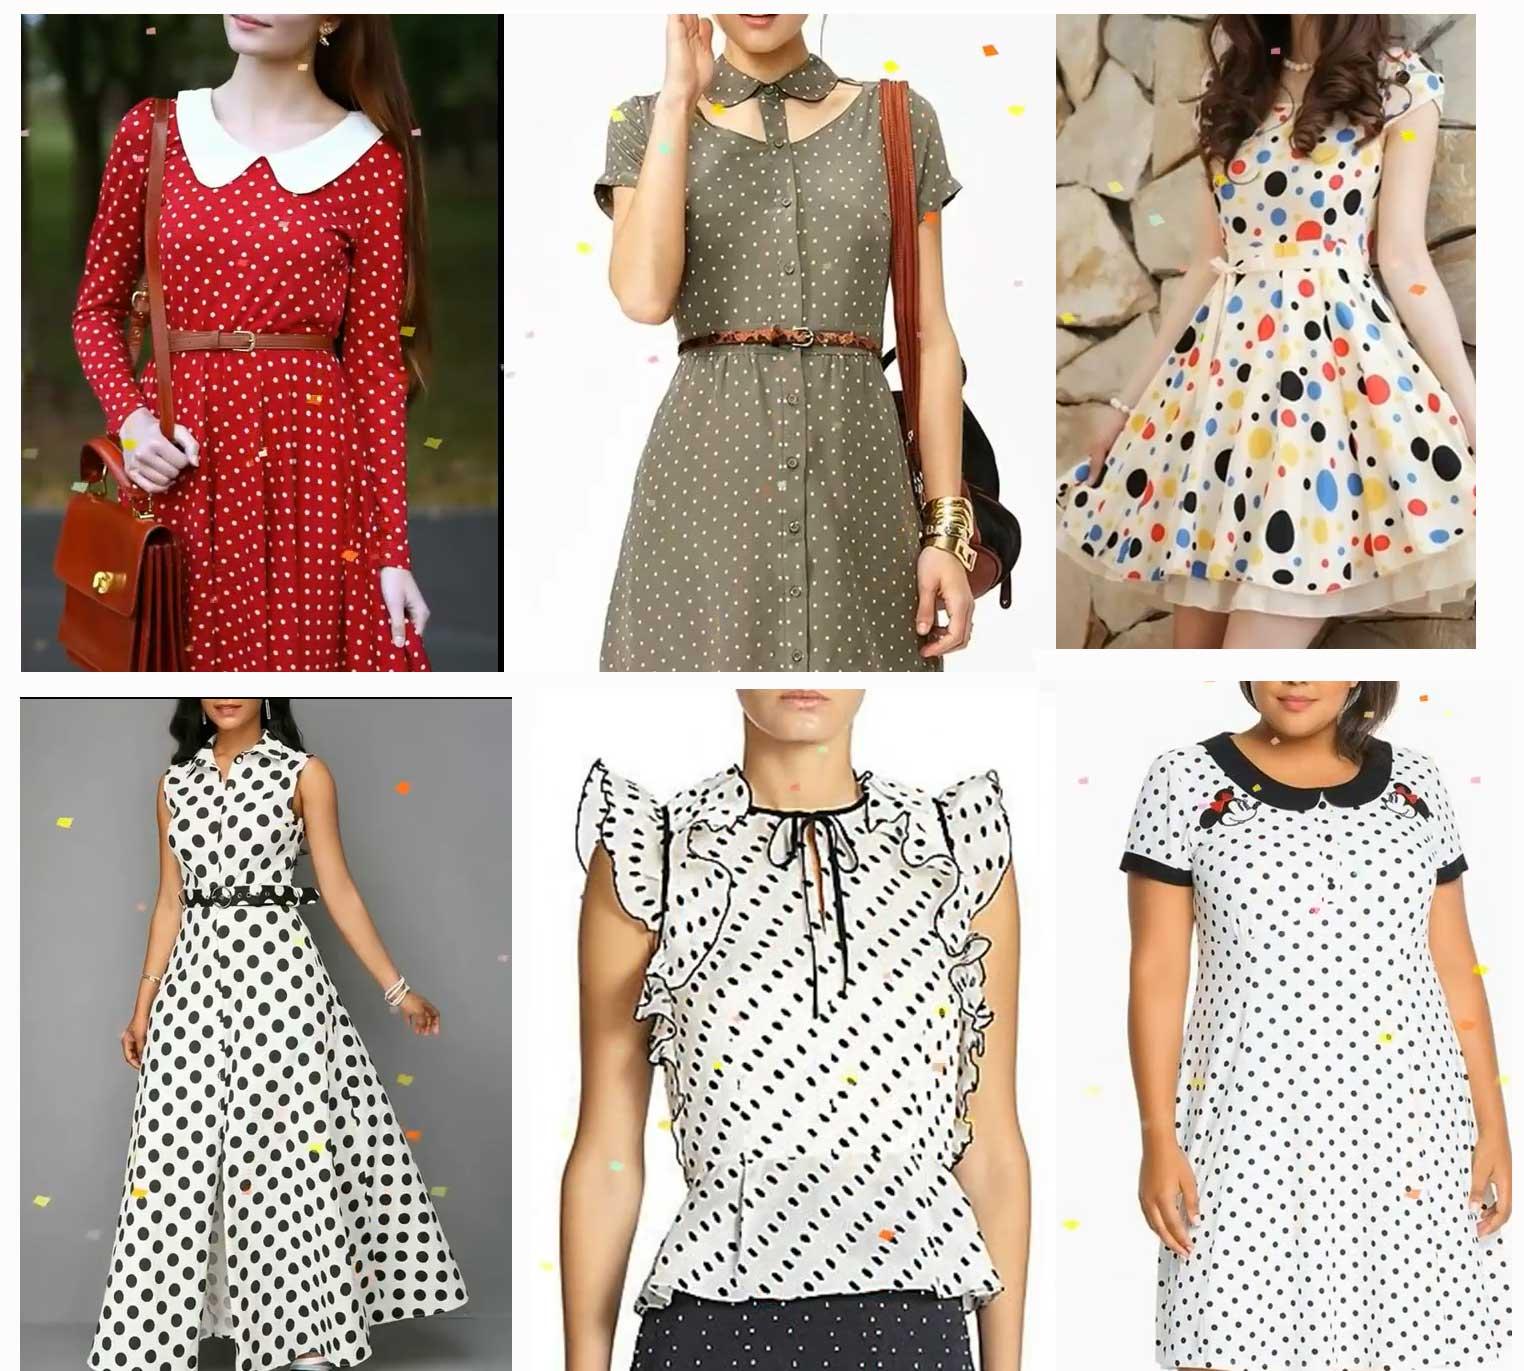 Polka dots dress designs Image Credit: Youtube